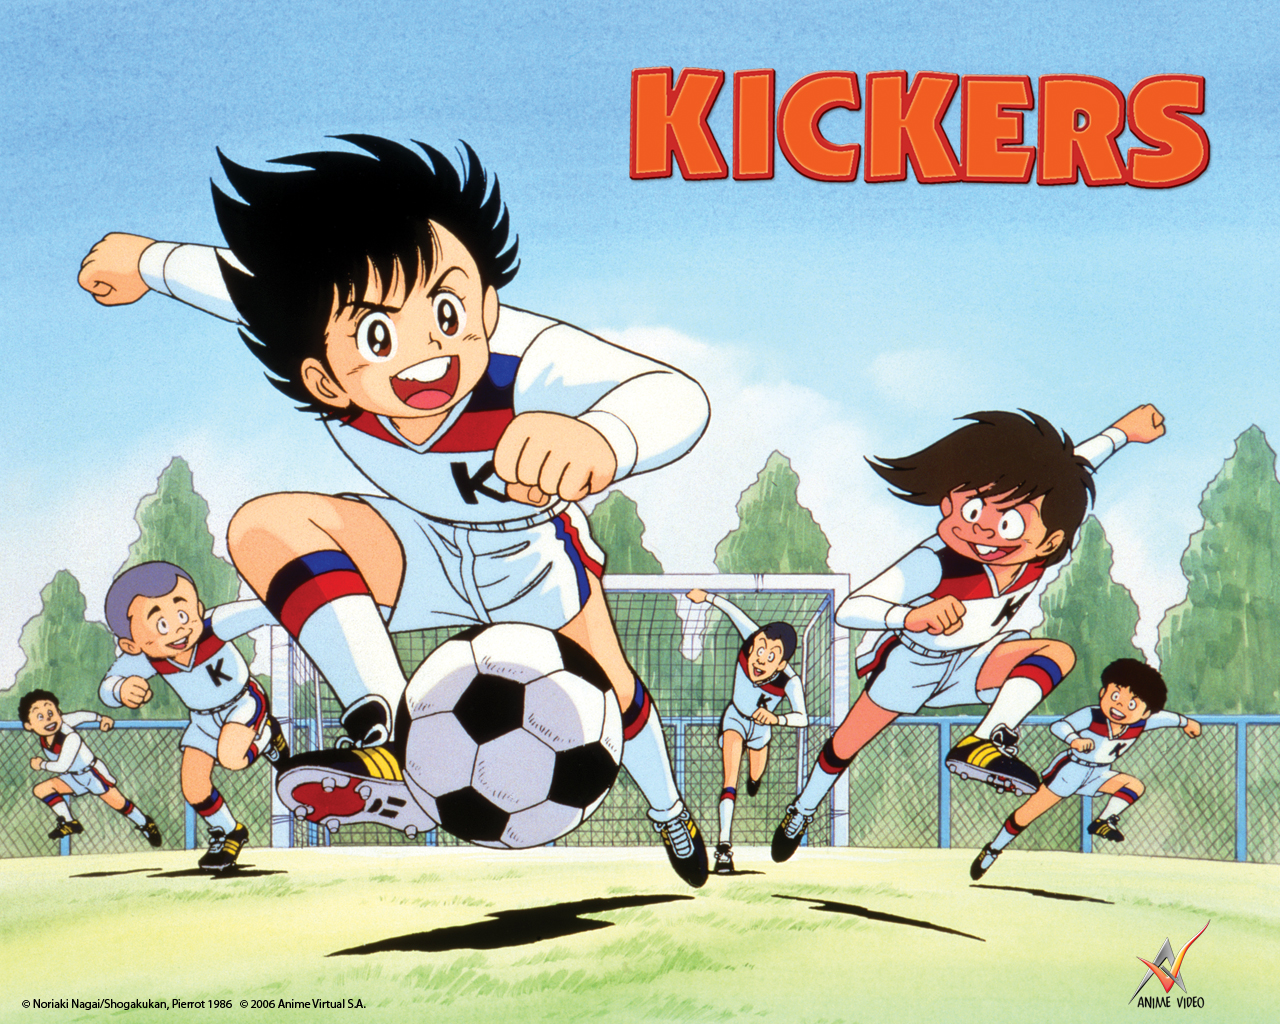 kickers serie stream